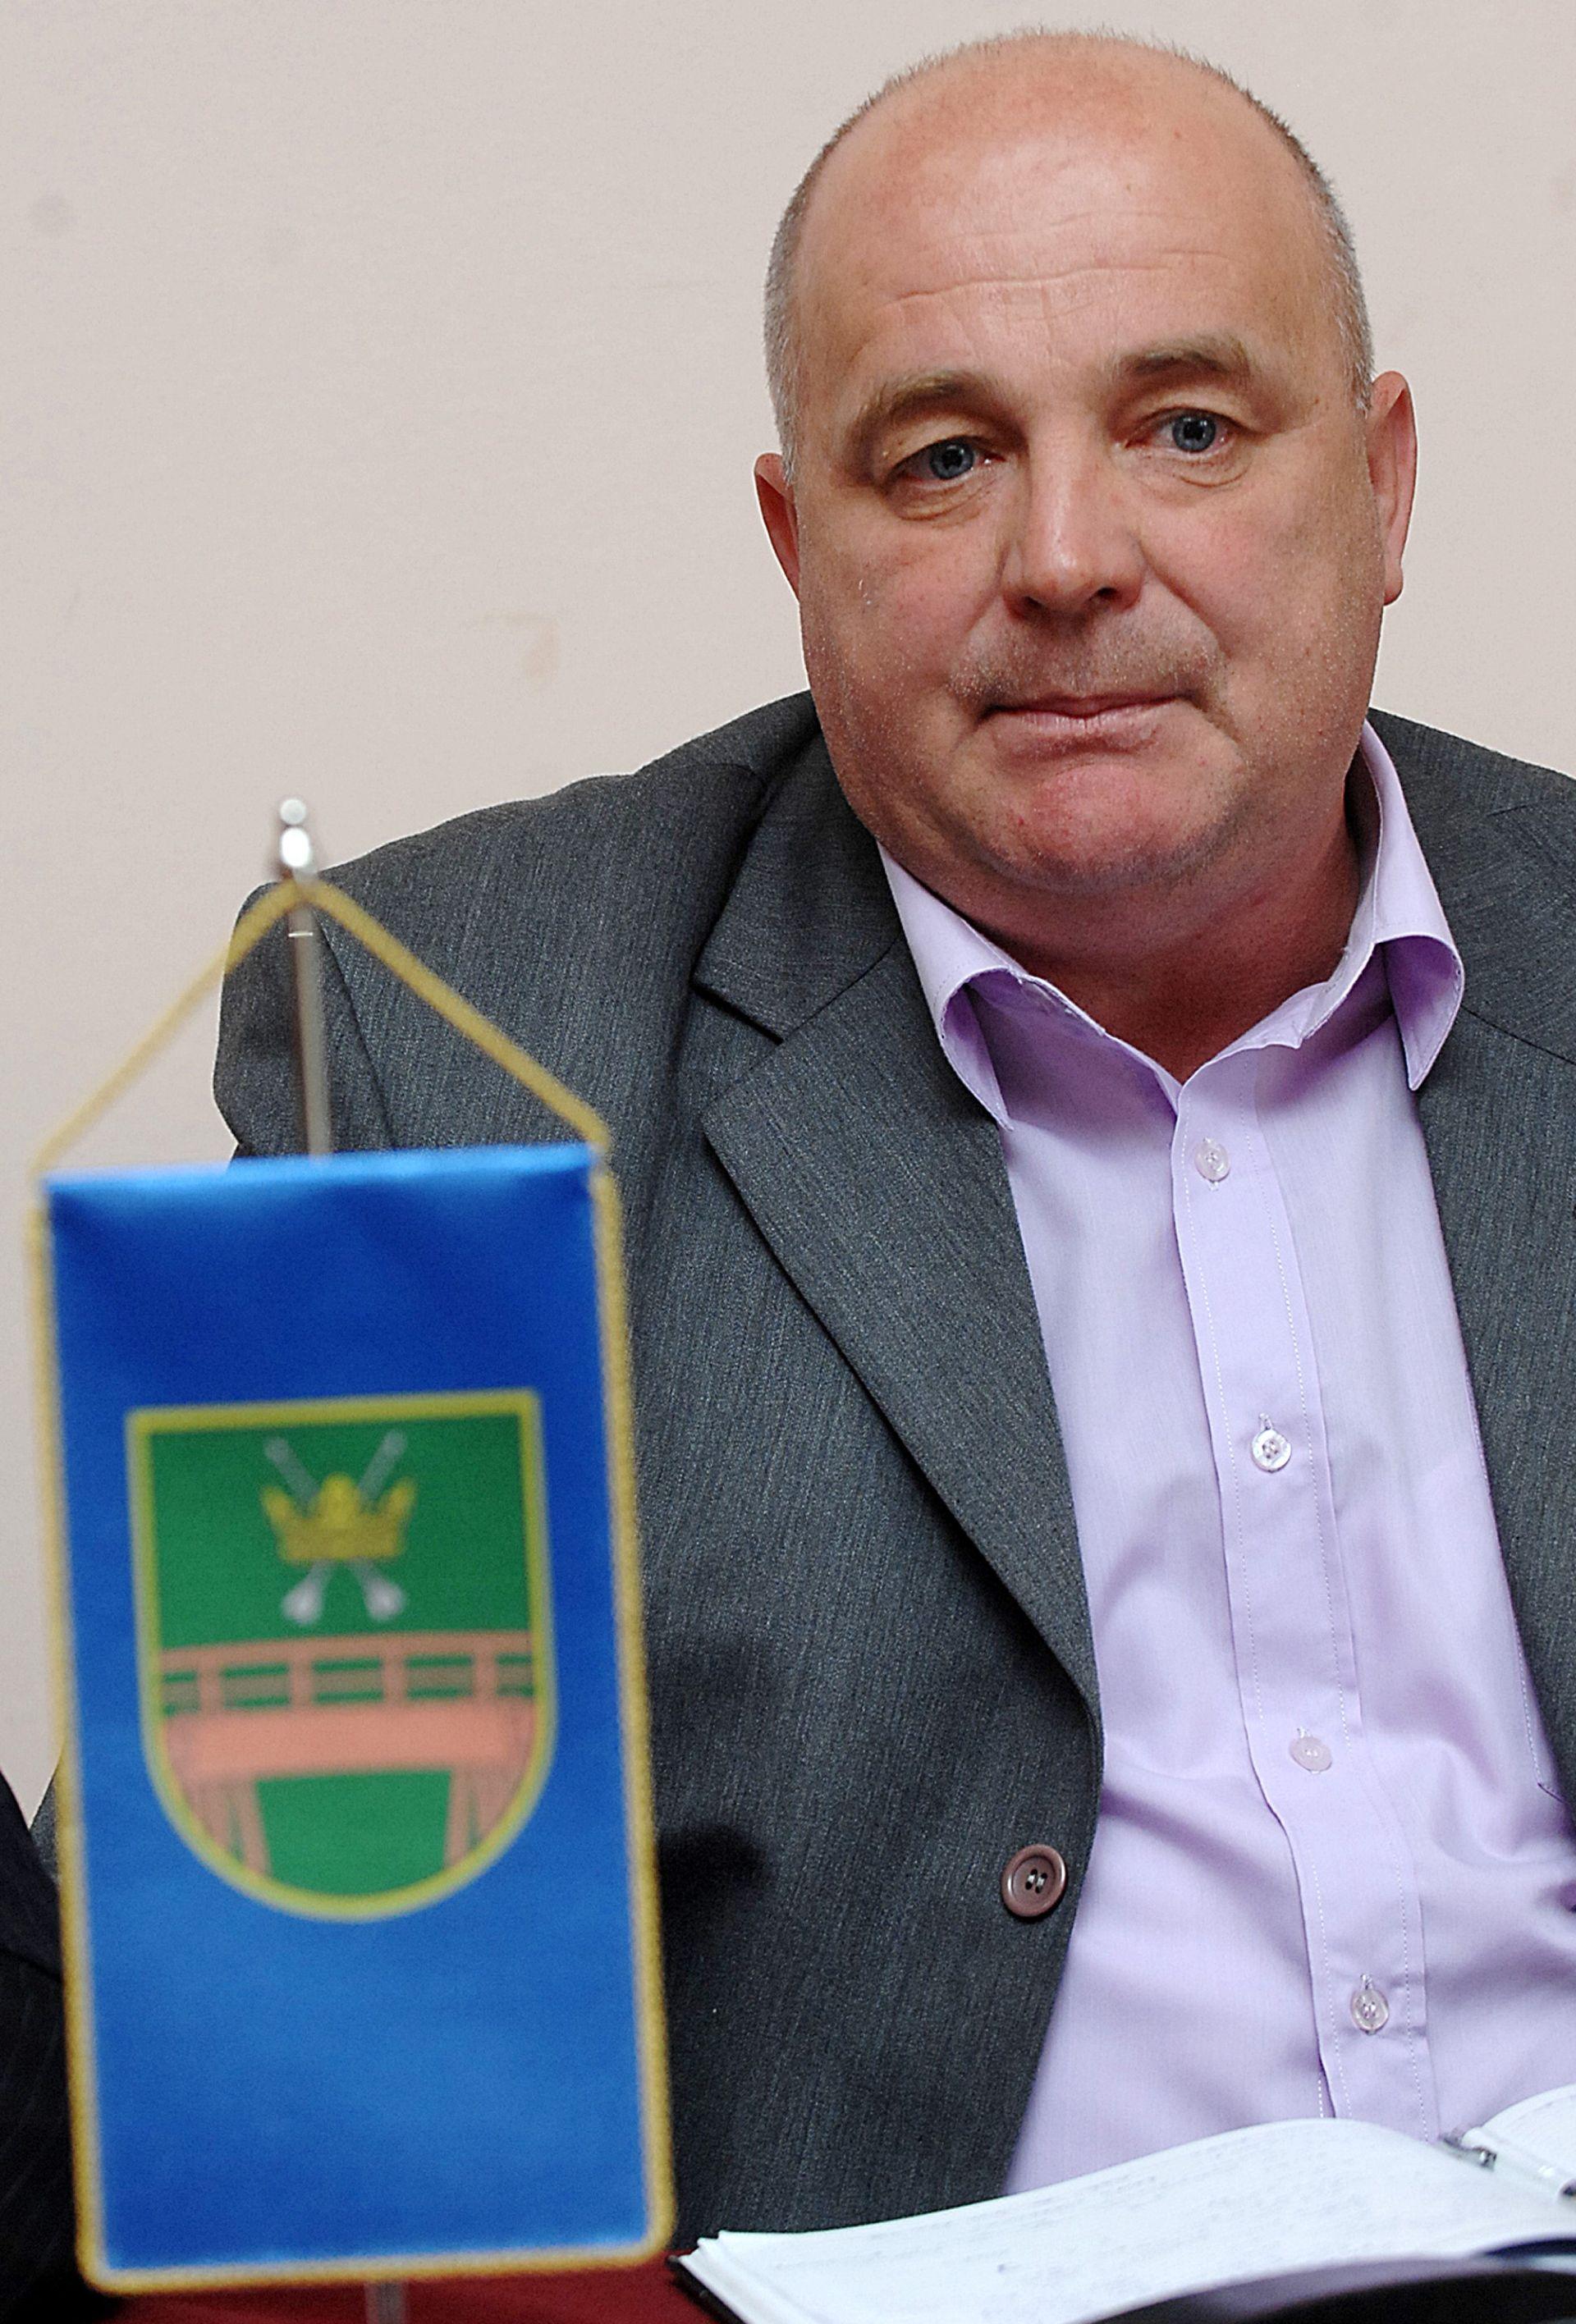 DRUGI KRUG: Načelnik Gvozda ponovno Branko Jovičić (SDSS)